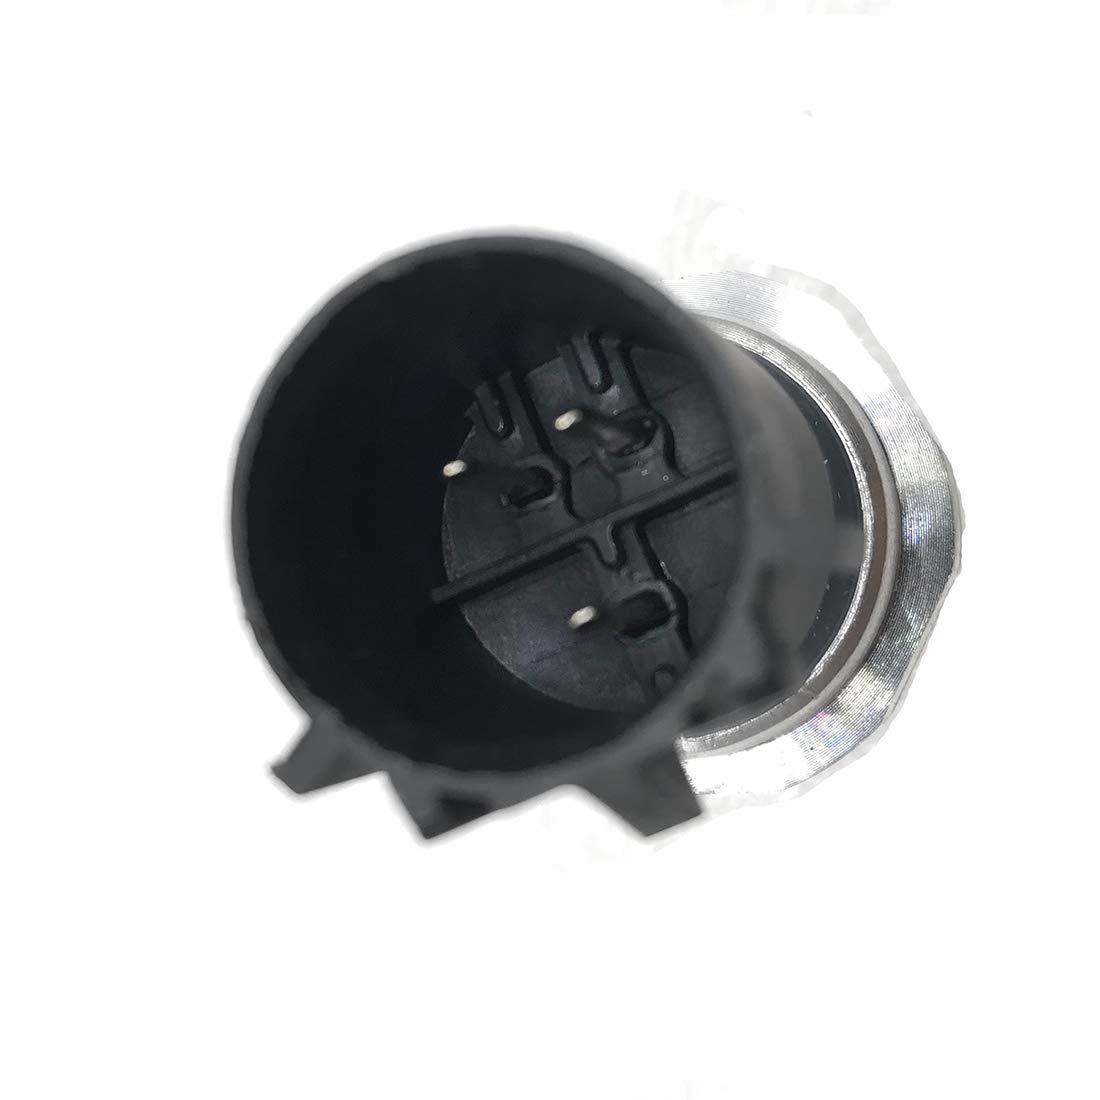 12621234 Engine Oil Pressure Sensor 12673134 213-4411 FOR GM Pontiac G8 GMC Yukon